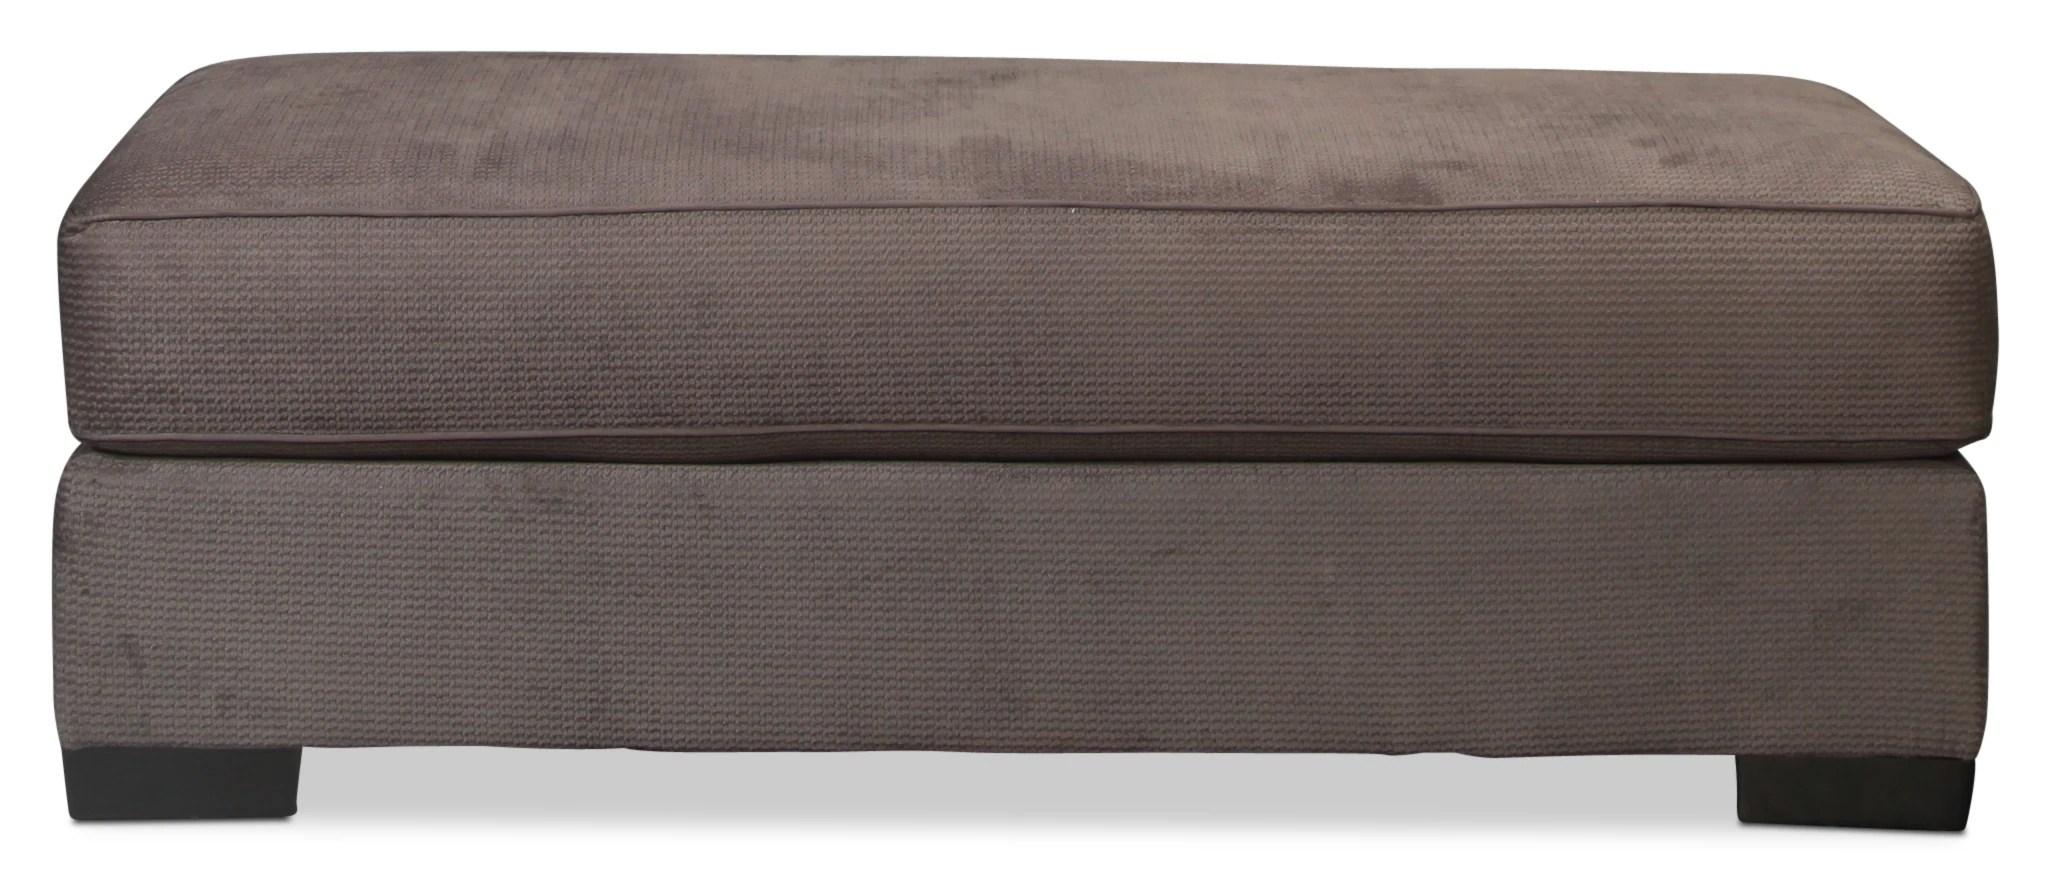 spartan sofa harga bed inoac asli the levin furniture